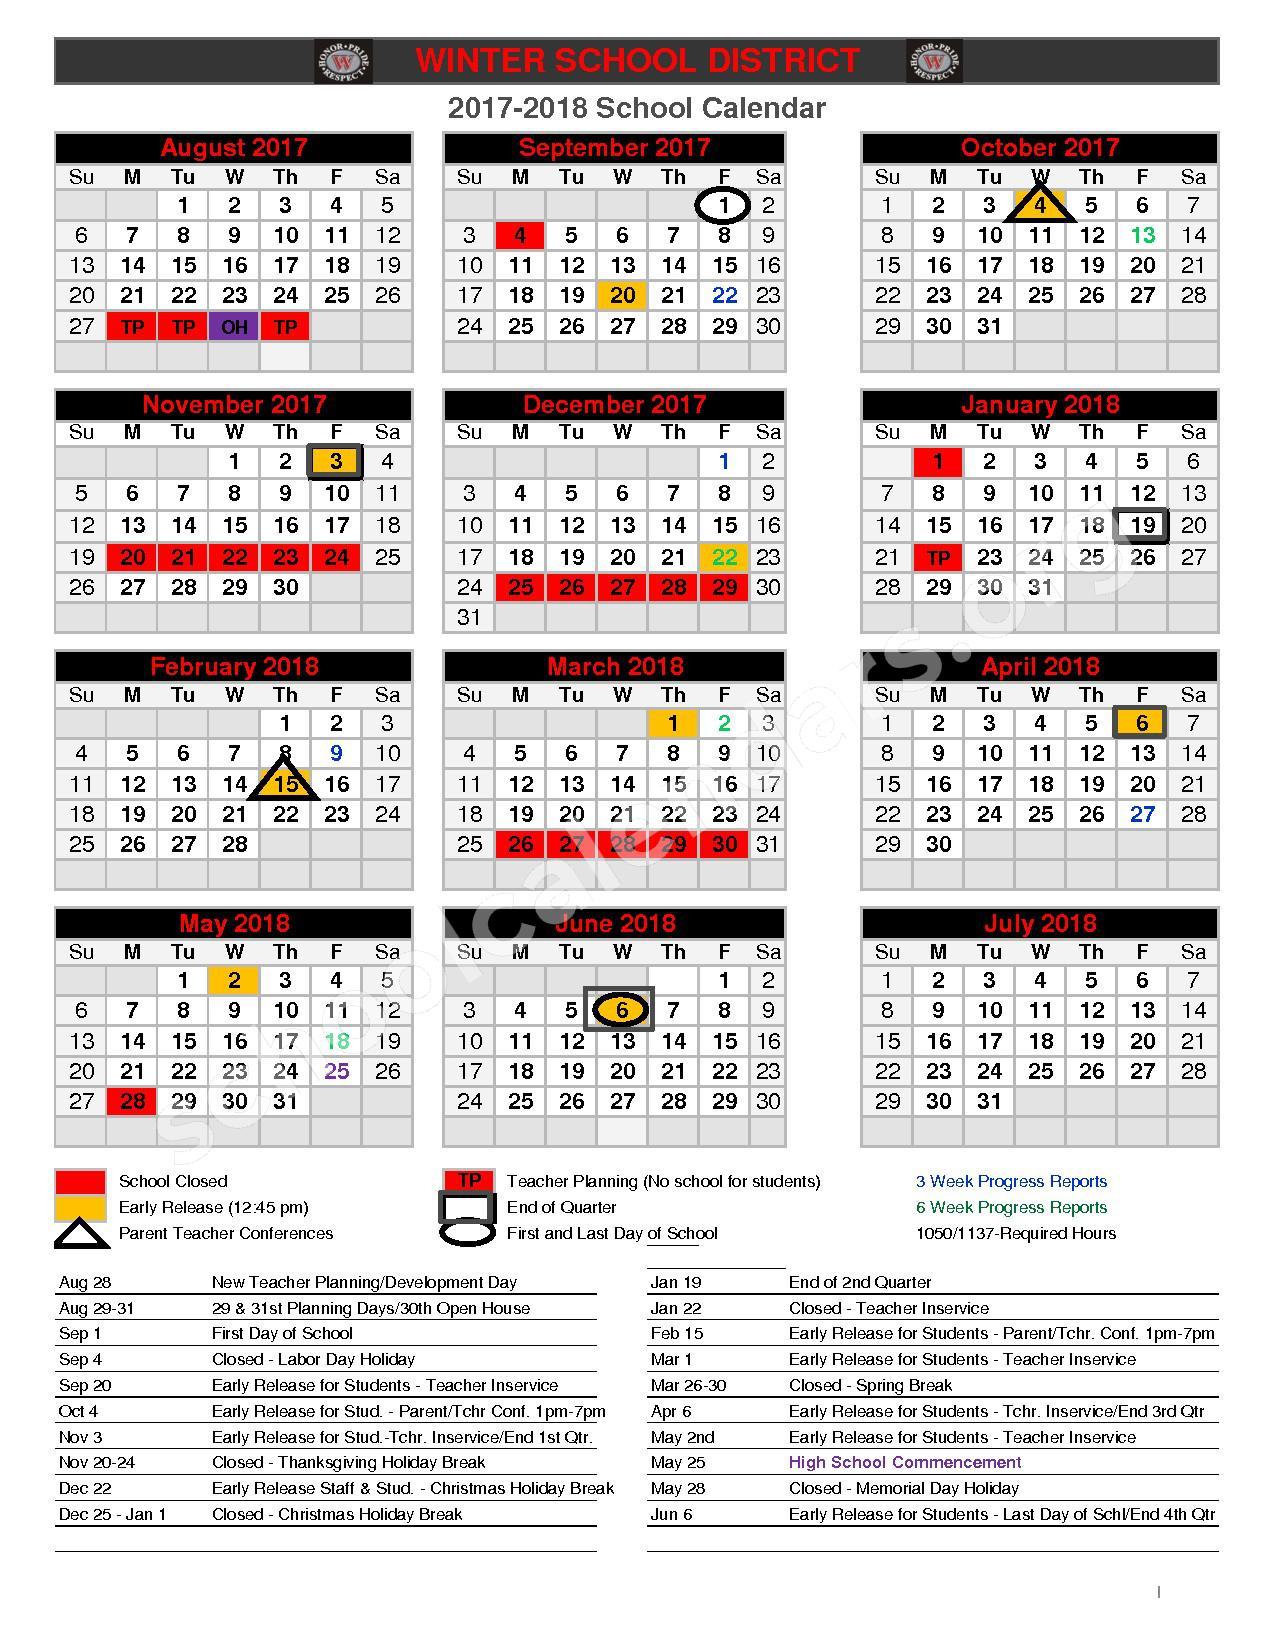 2017 - 2018 School Calendar – Winter School District – page 1